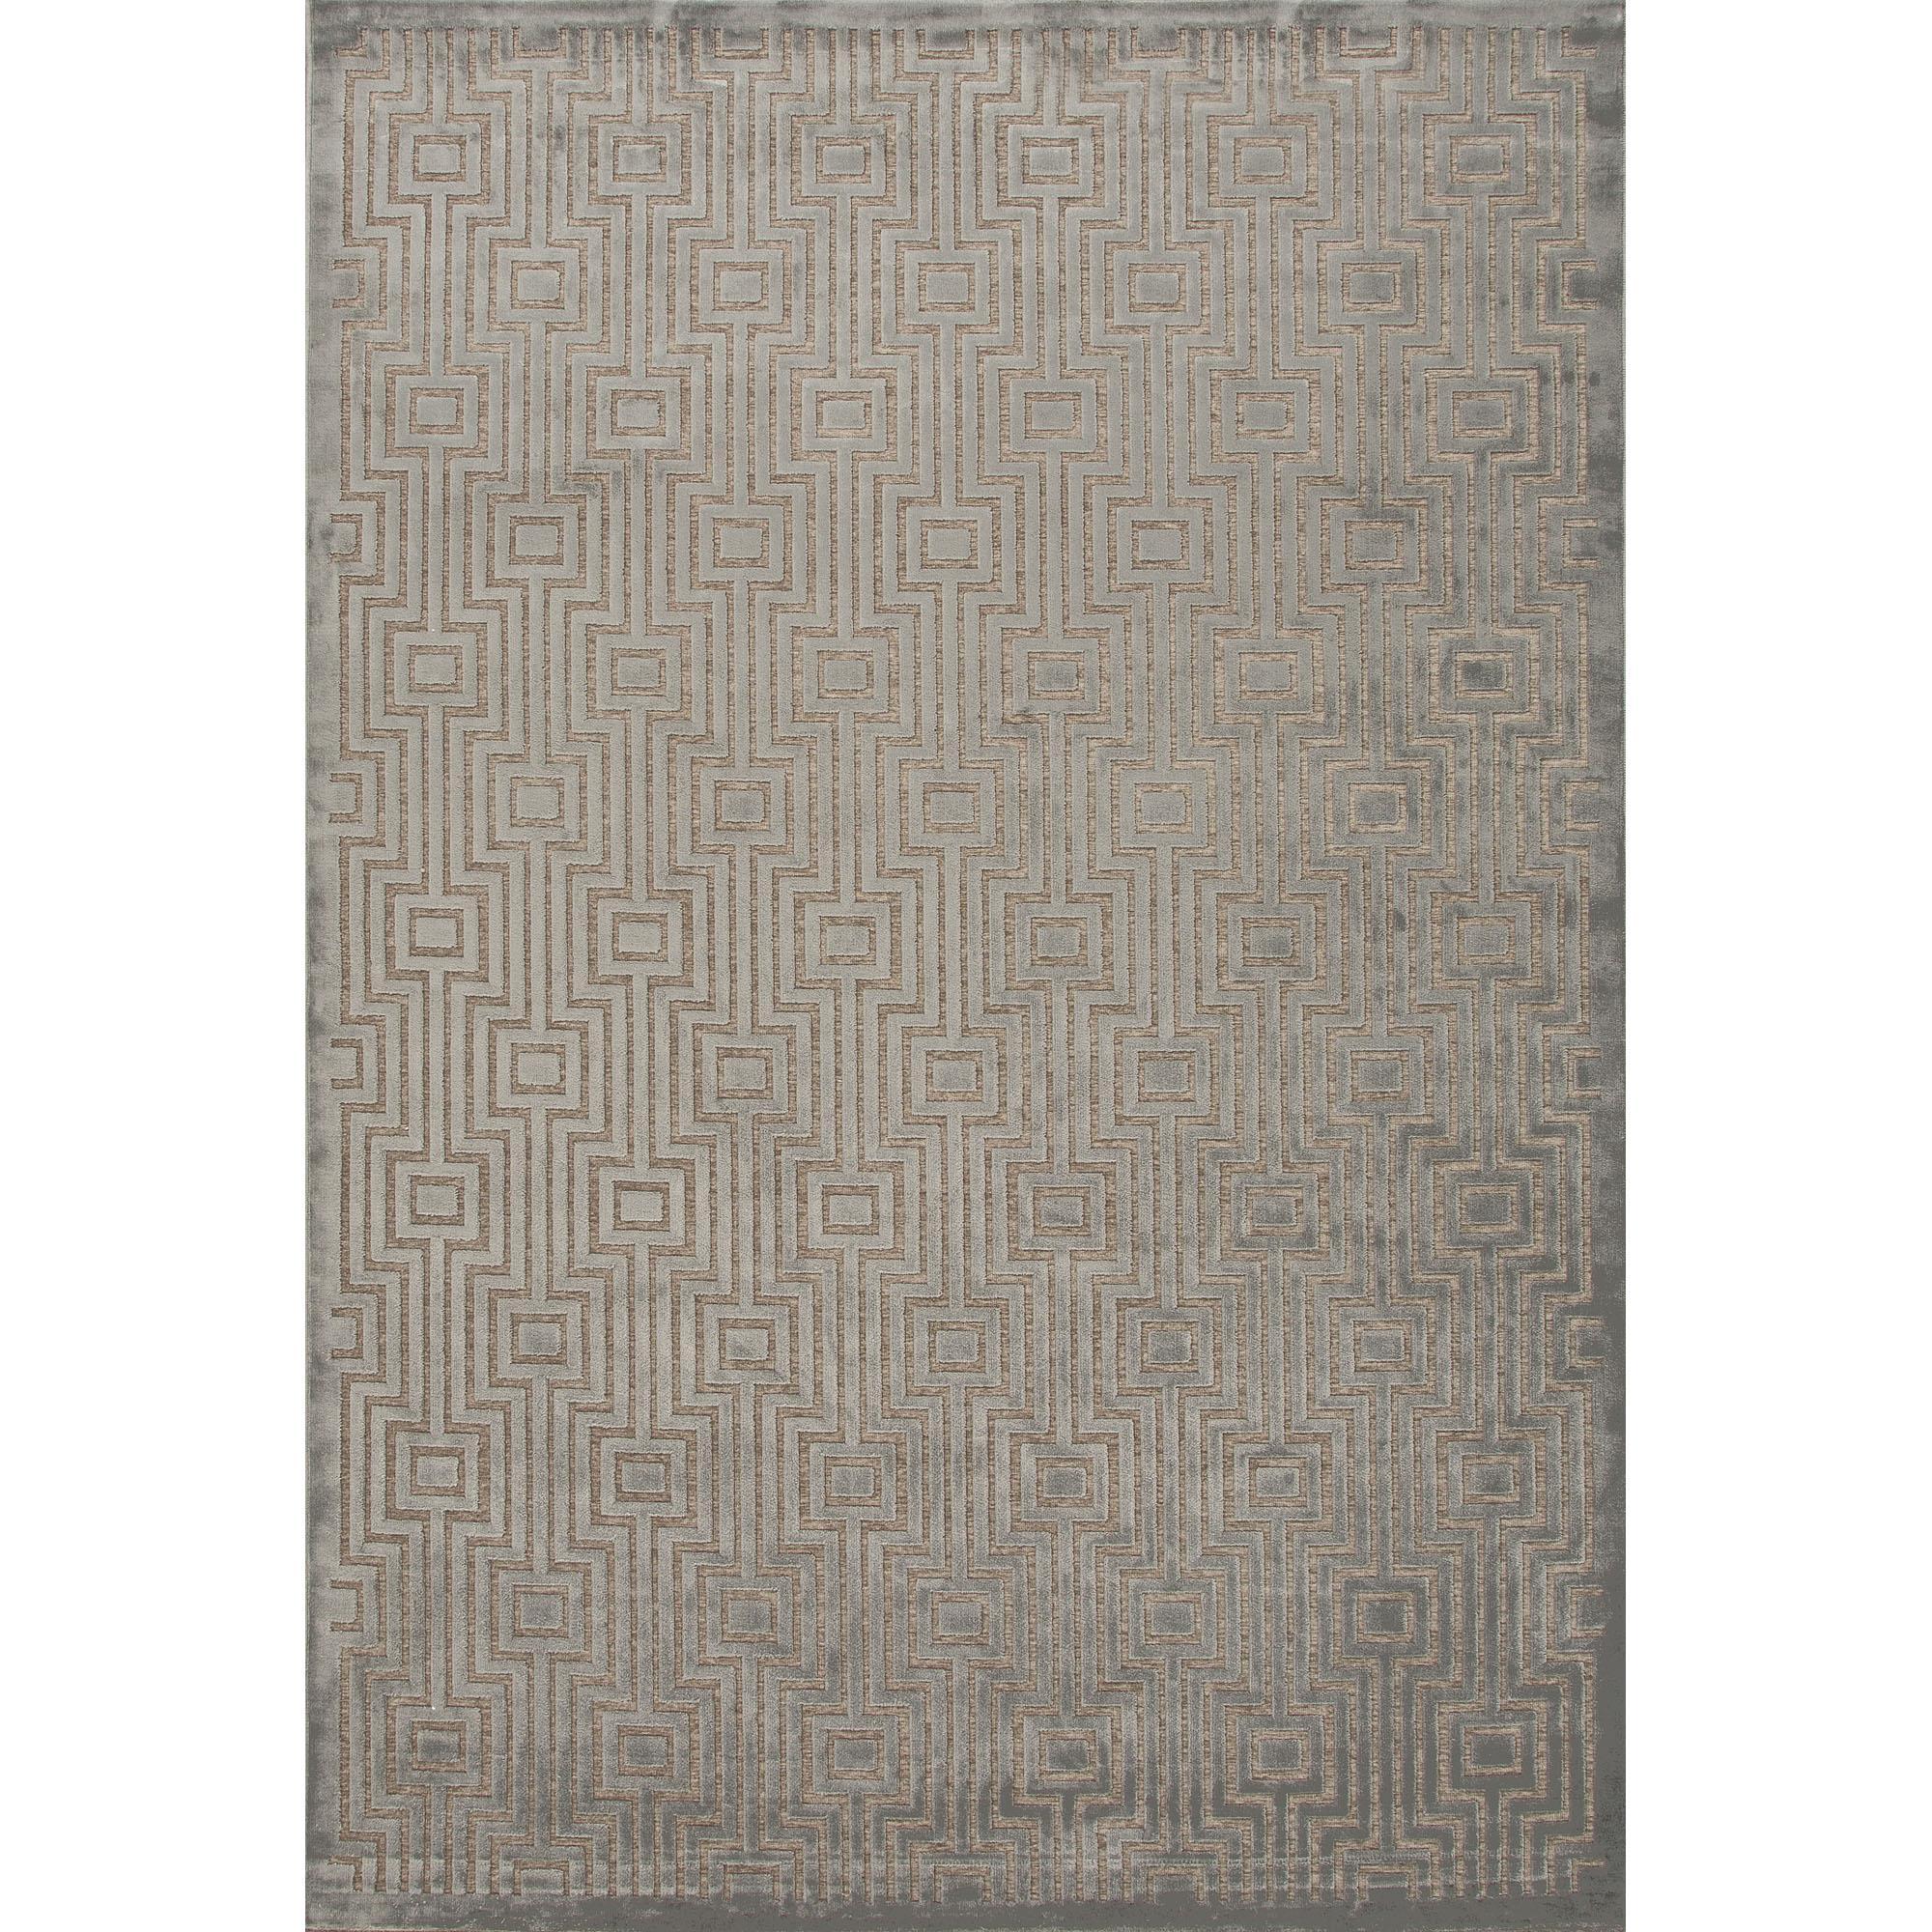 JAIPUR Rugs Fables 9 x 12 Rug - Item Number: RUG113555